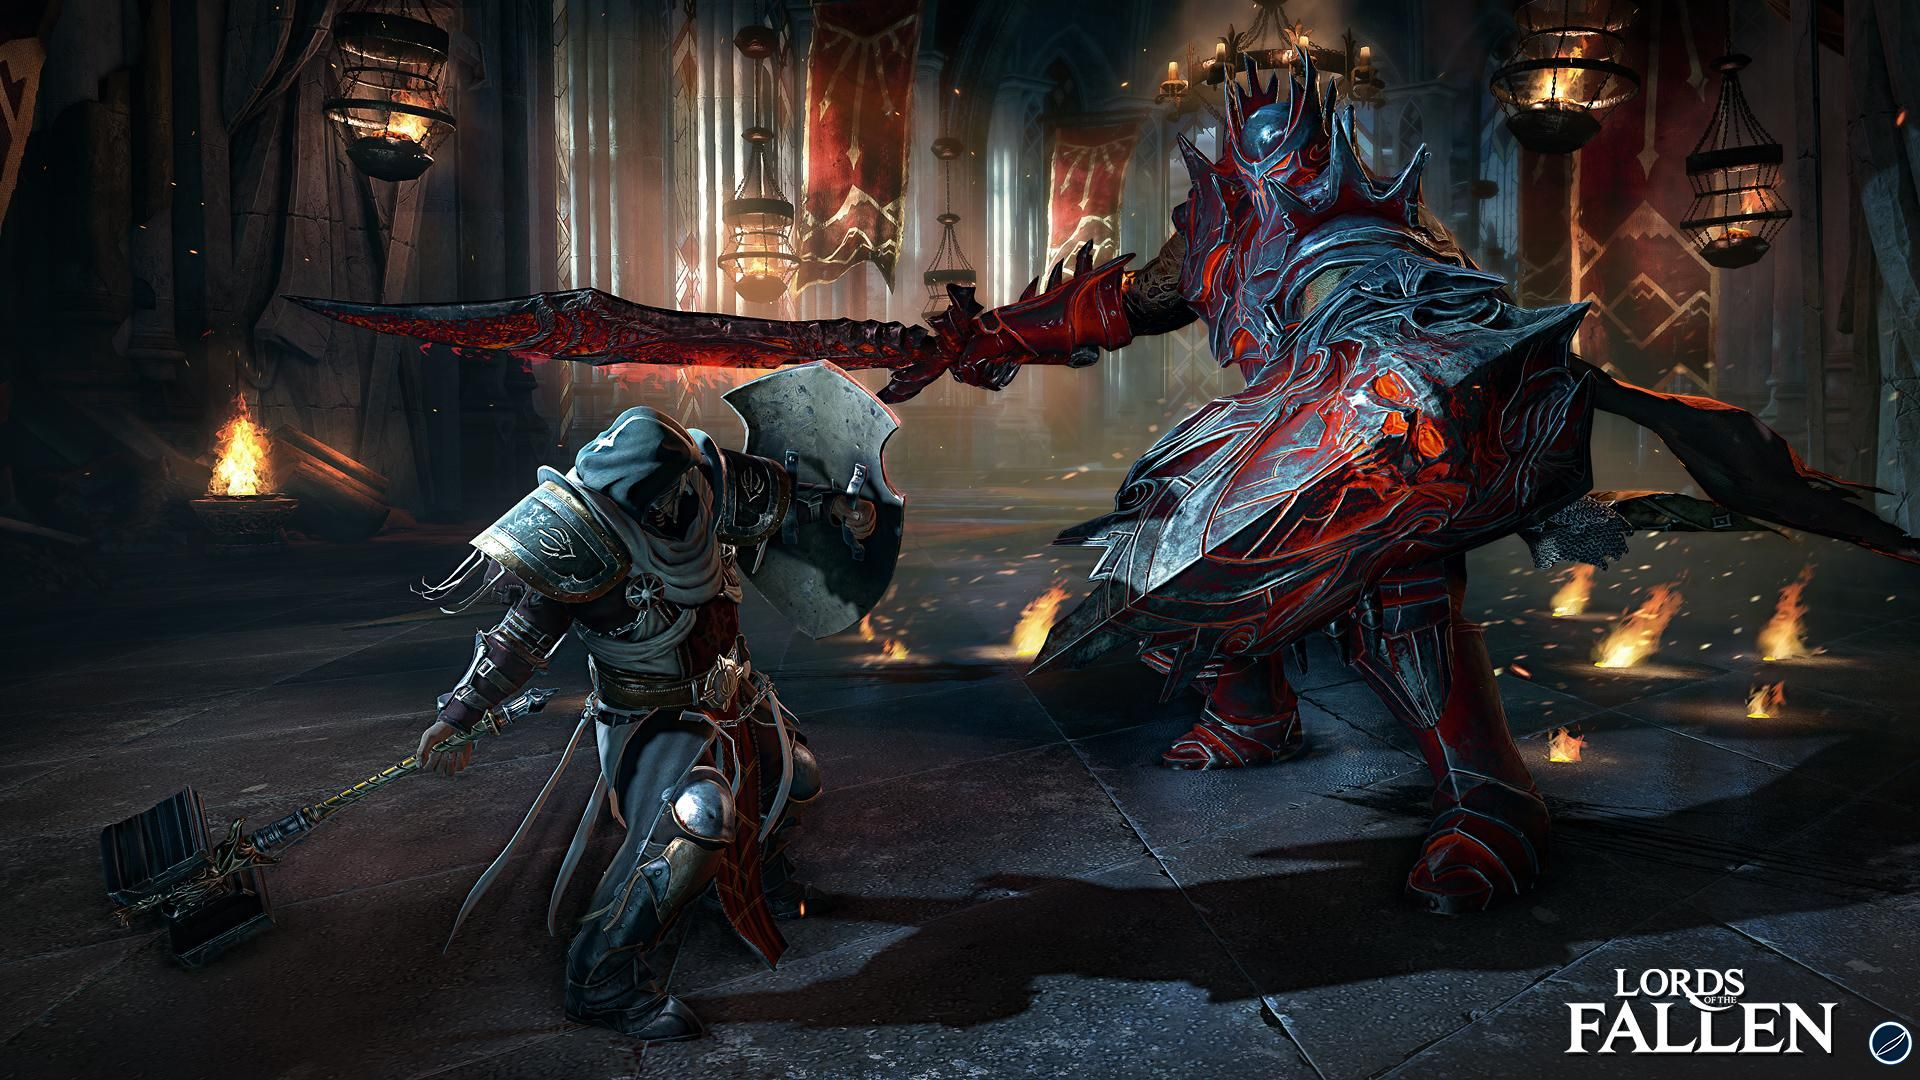 lords-of-the-fallen_XboxOne_w_2156.jpg